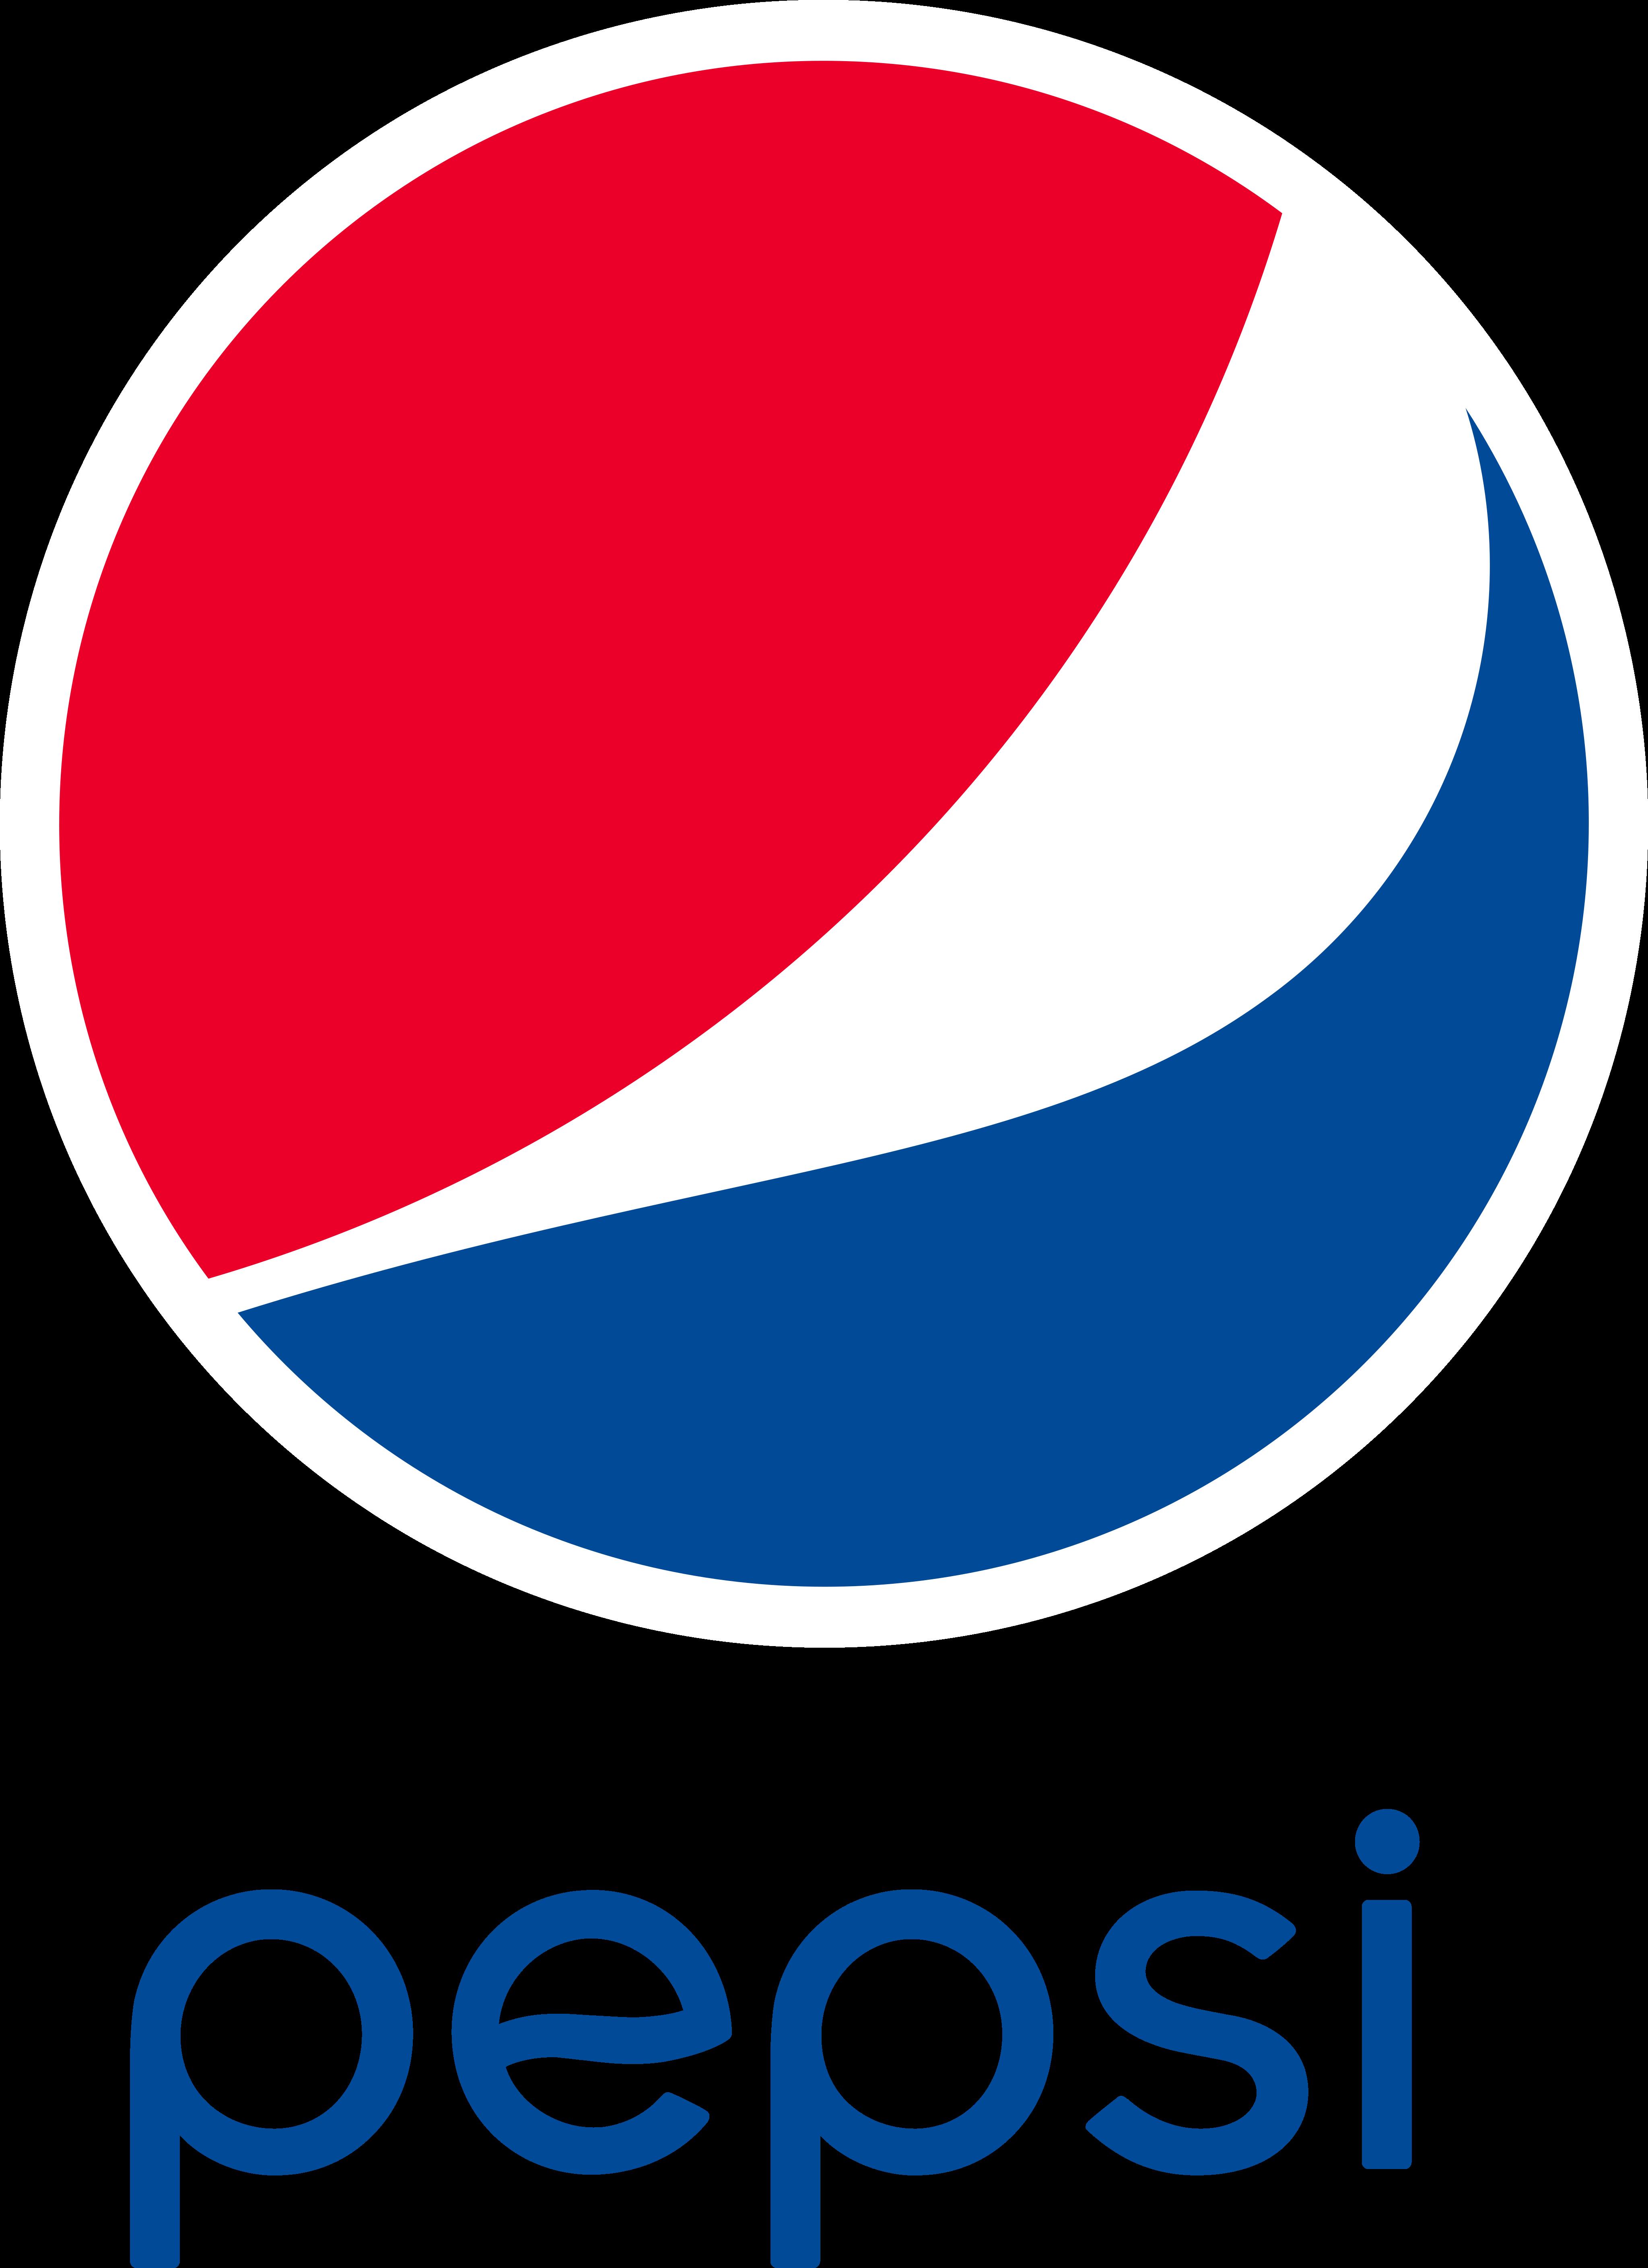 pepsi logo 1 1 - Pepsi Logo